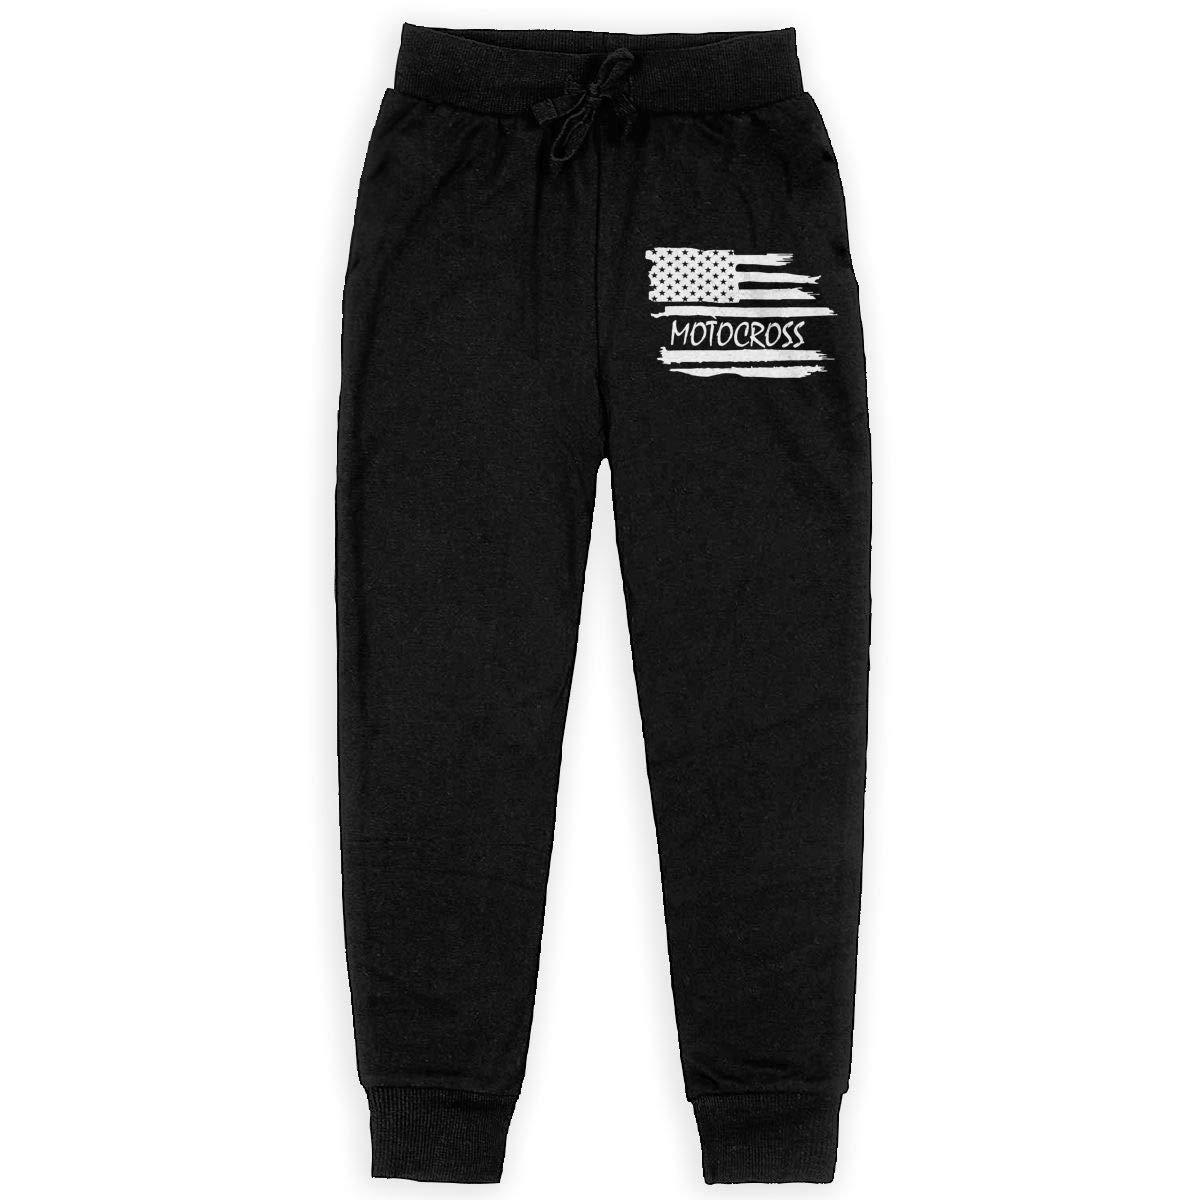 WYZVK22 Motocross American Flag Soft//Cozy Sweatpants Boys Fleece Pants for Teenager Boys